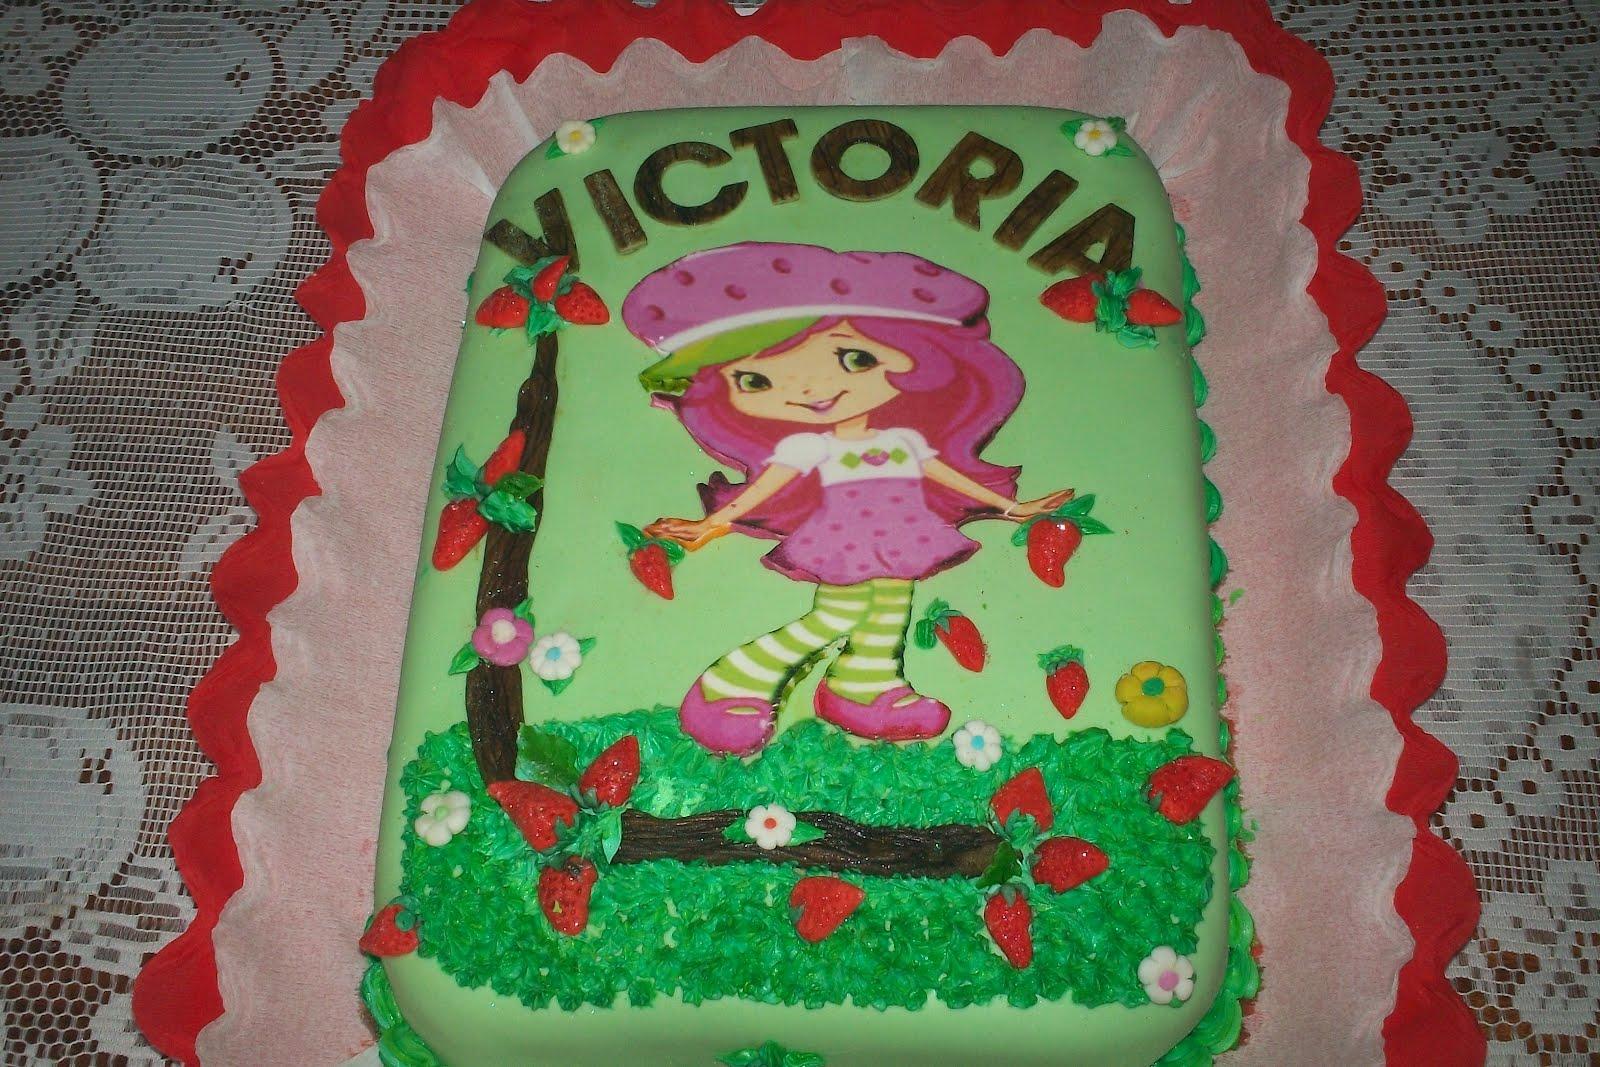 REPOSTERIA ARTESANAL MARIJO 0426-9159361: Torta Frutillita ...